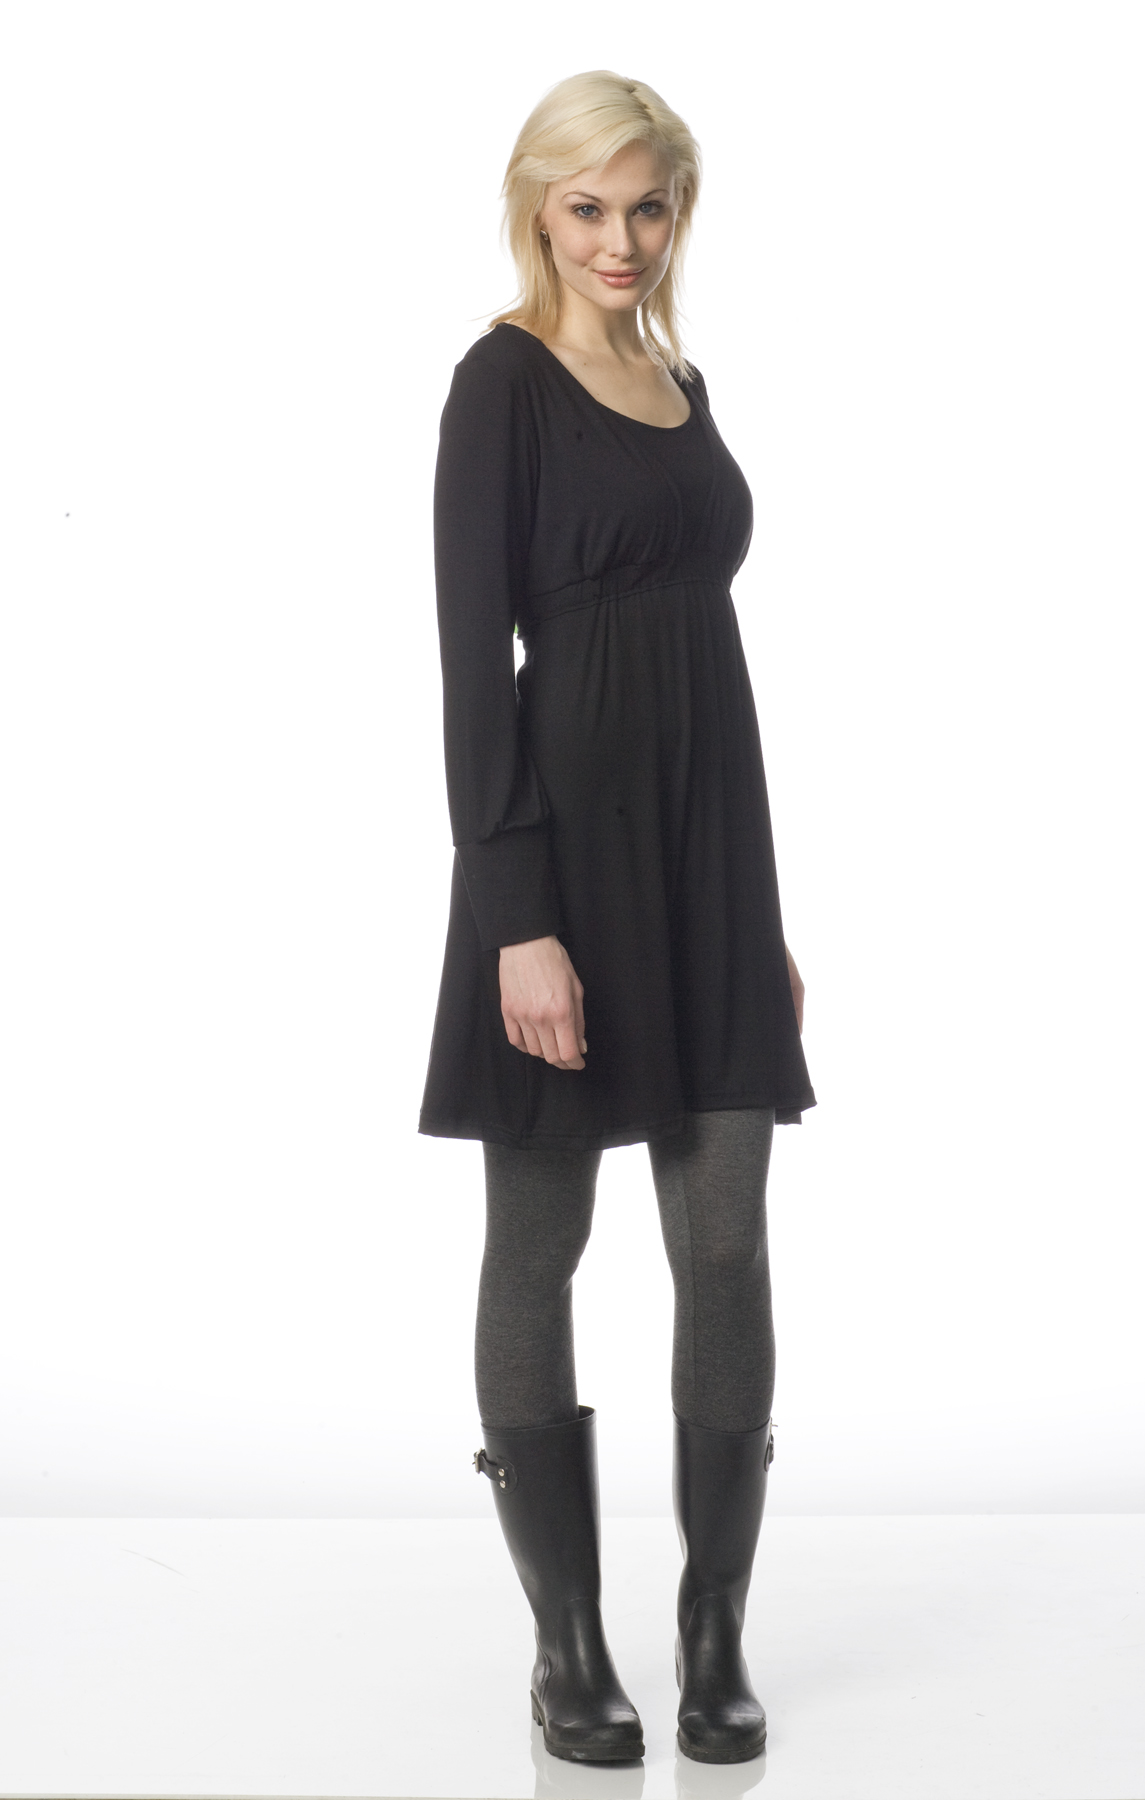 nixilu-bohemian-nursing-tunic-top-black.jpg